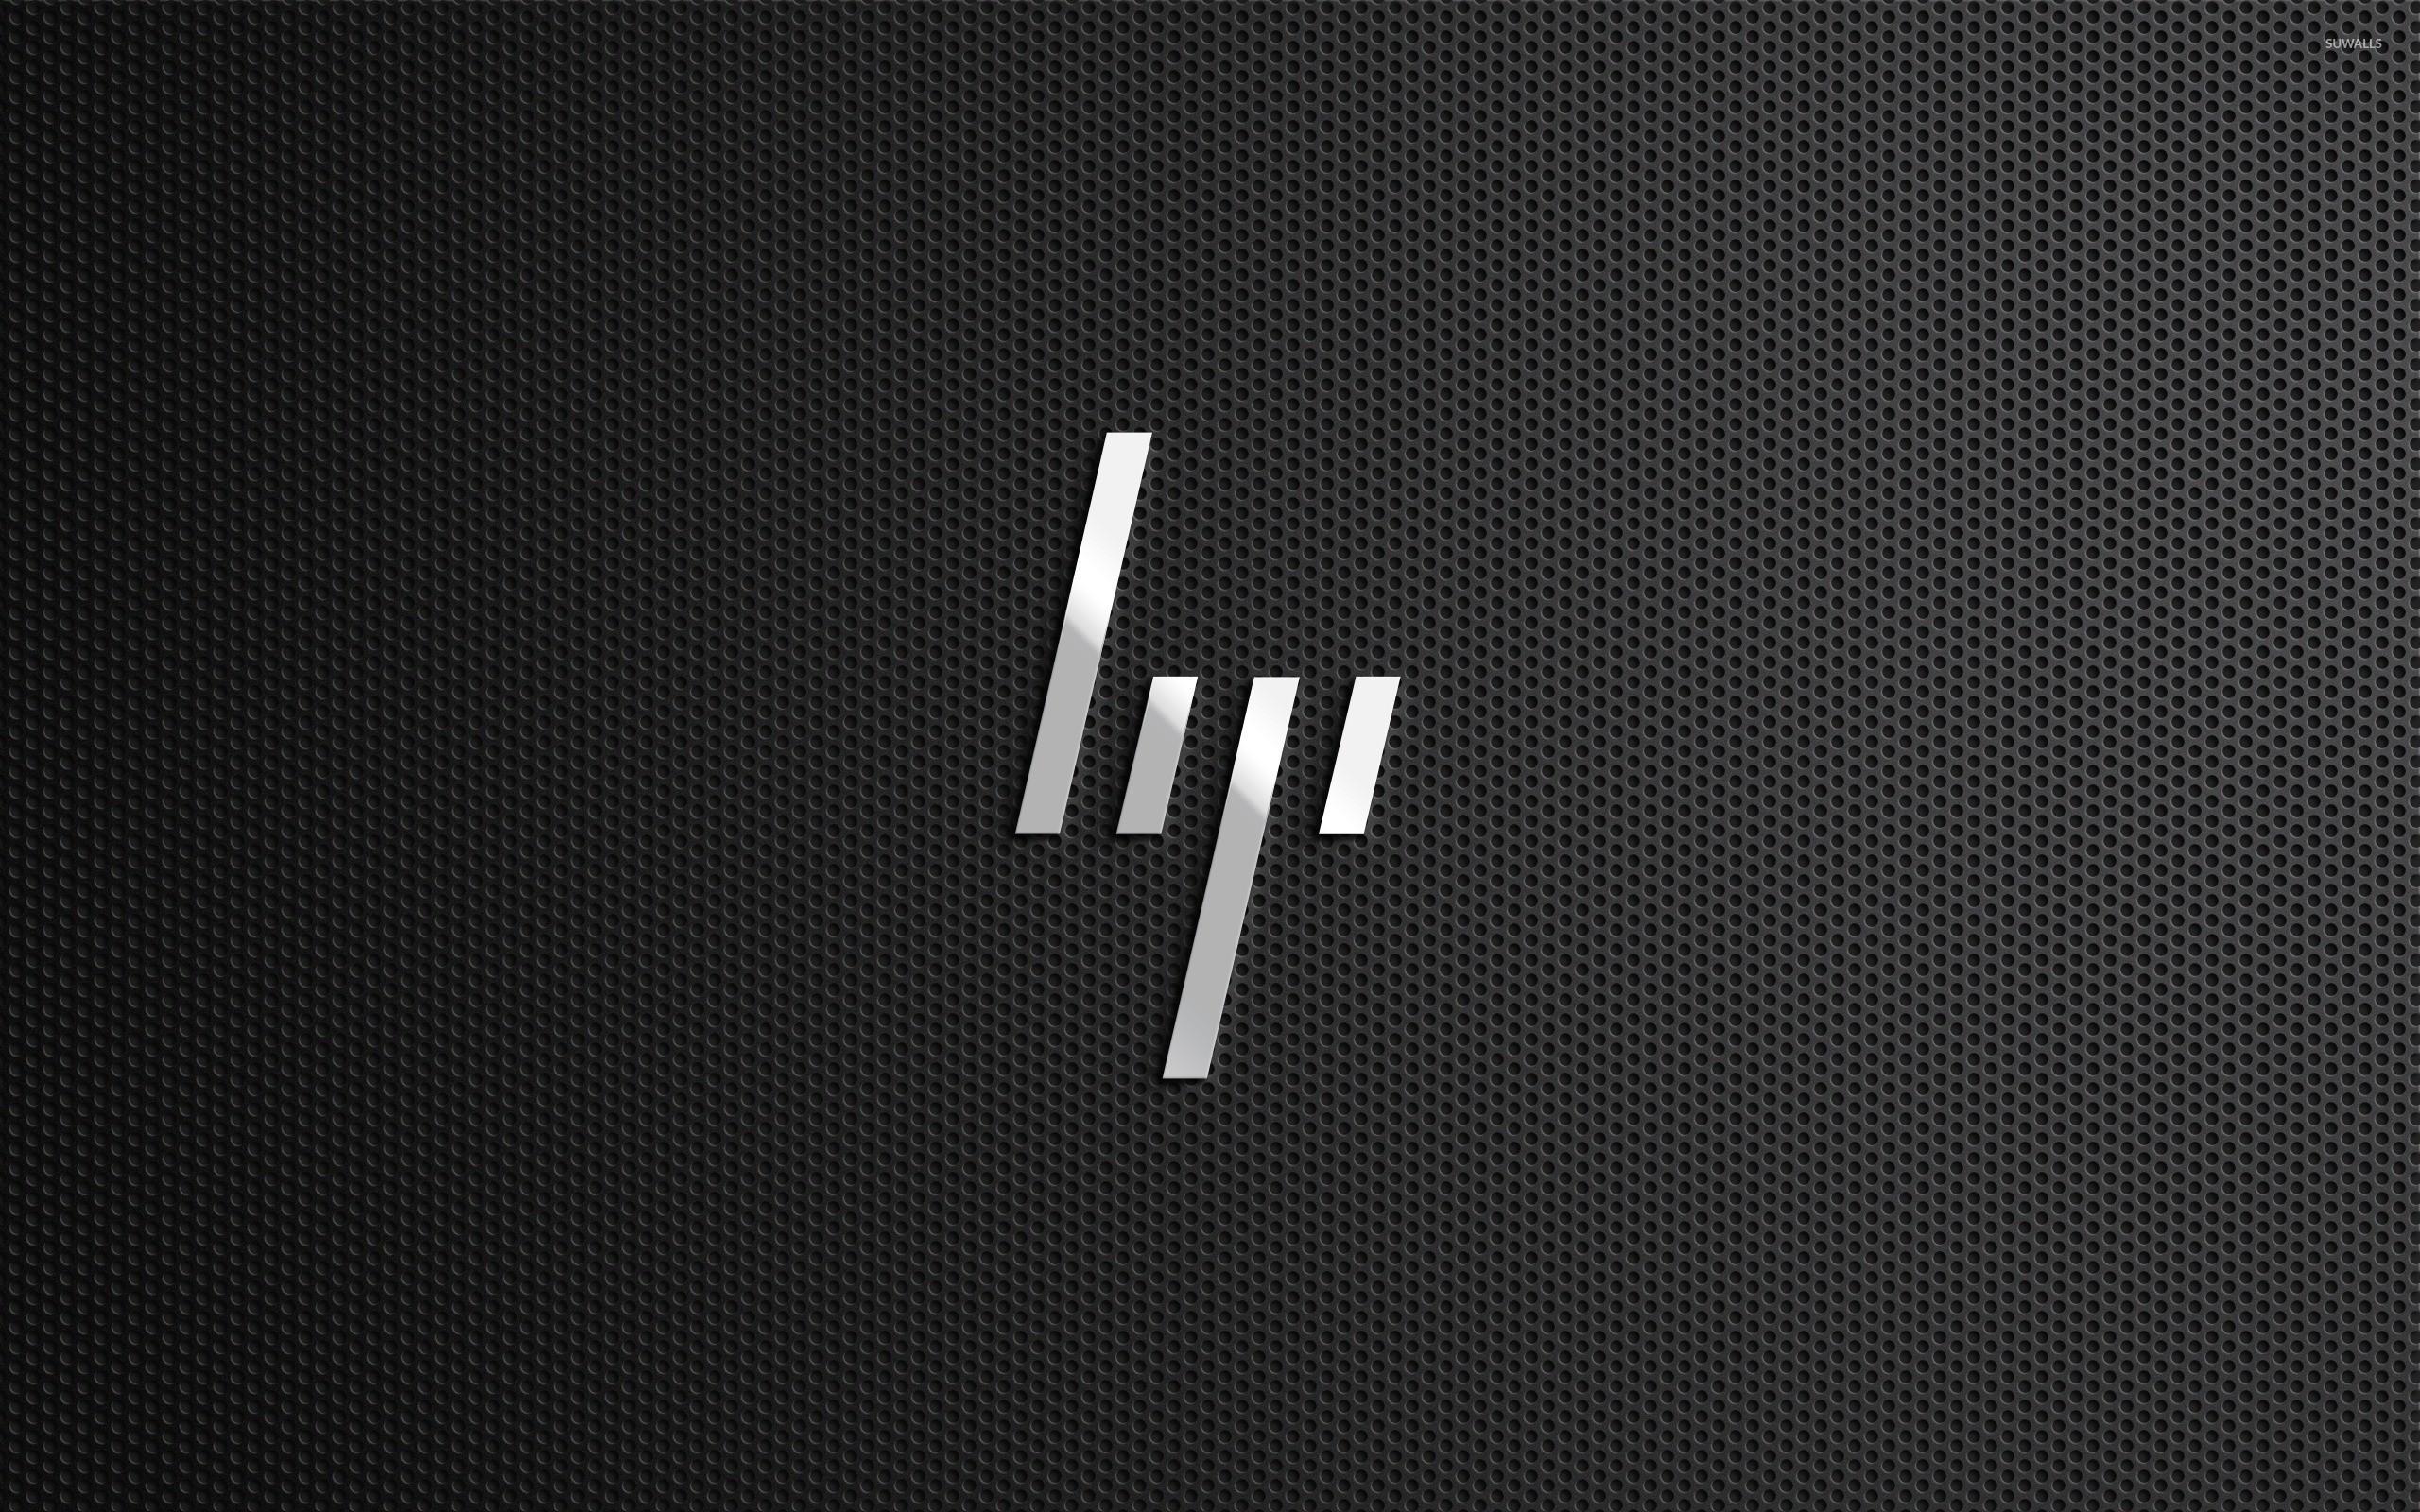 hp spectre wallpaper download